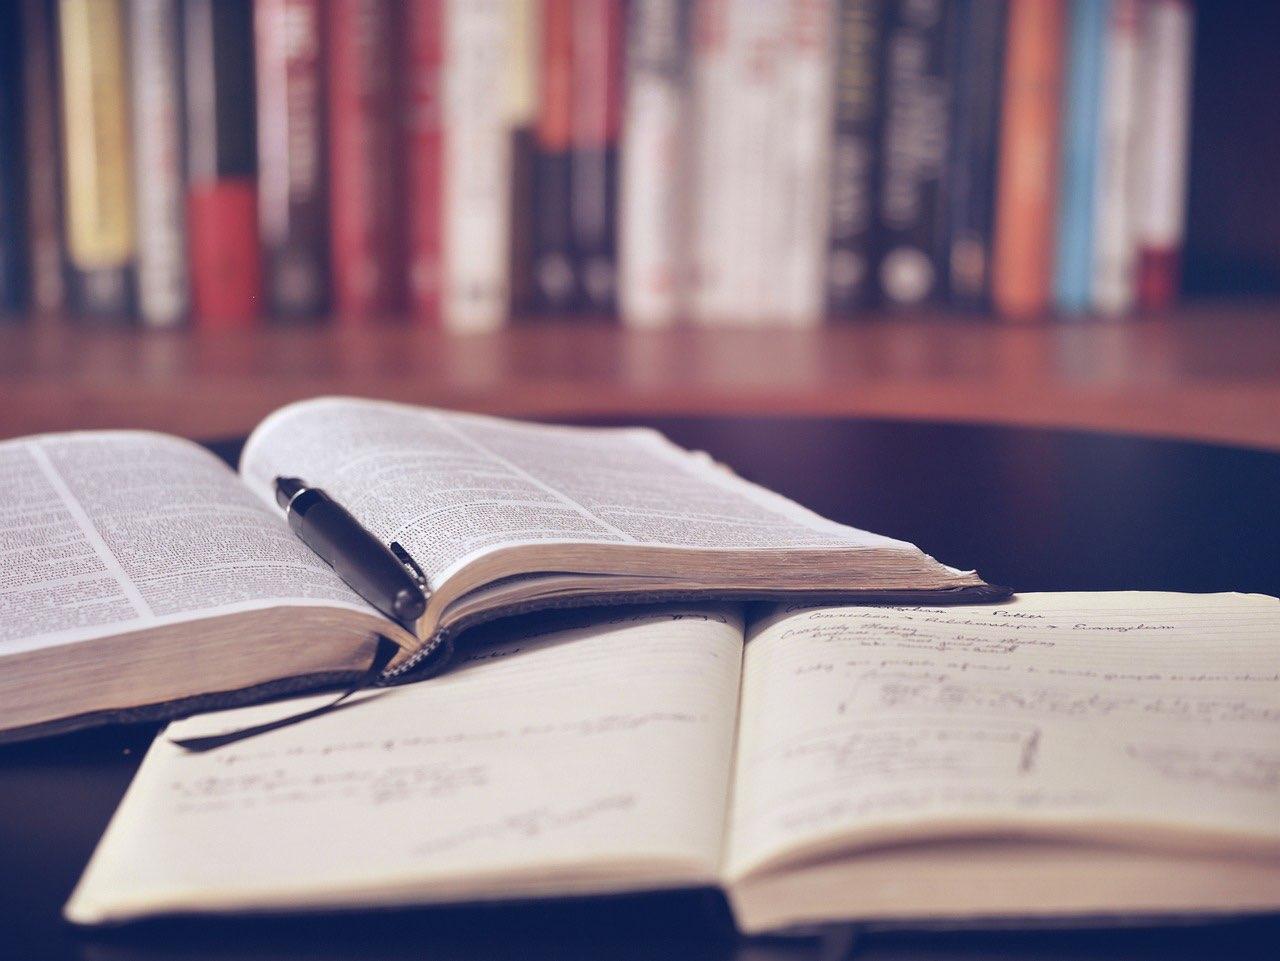 Study In Library (Pixabay Free Image) - AspirantSG